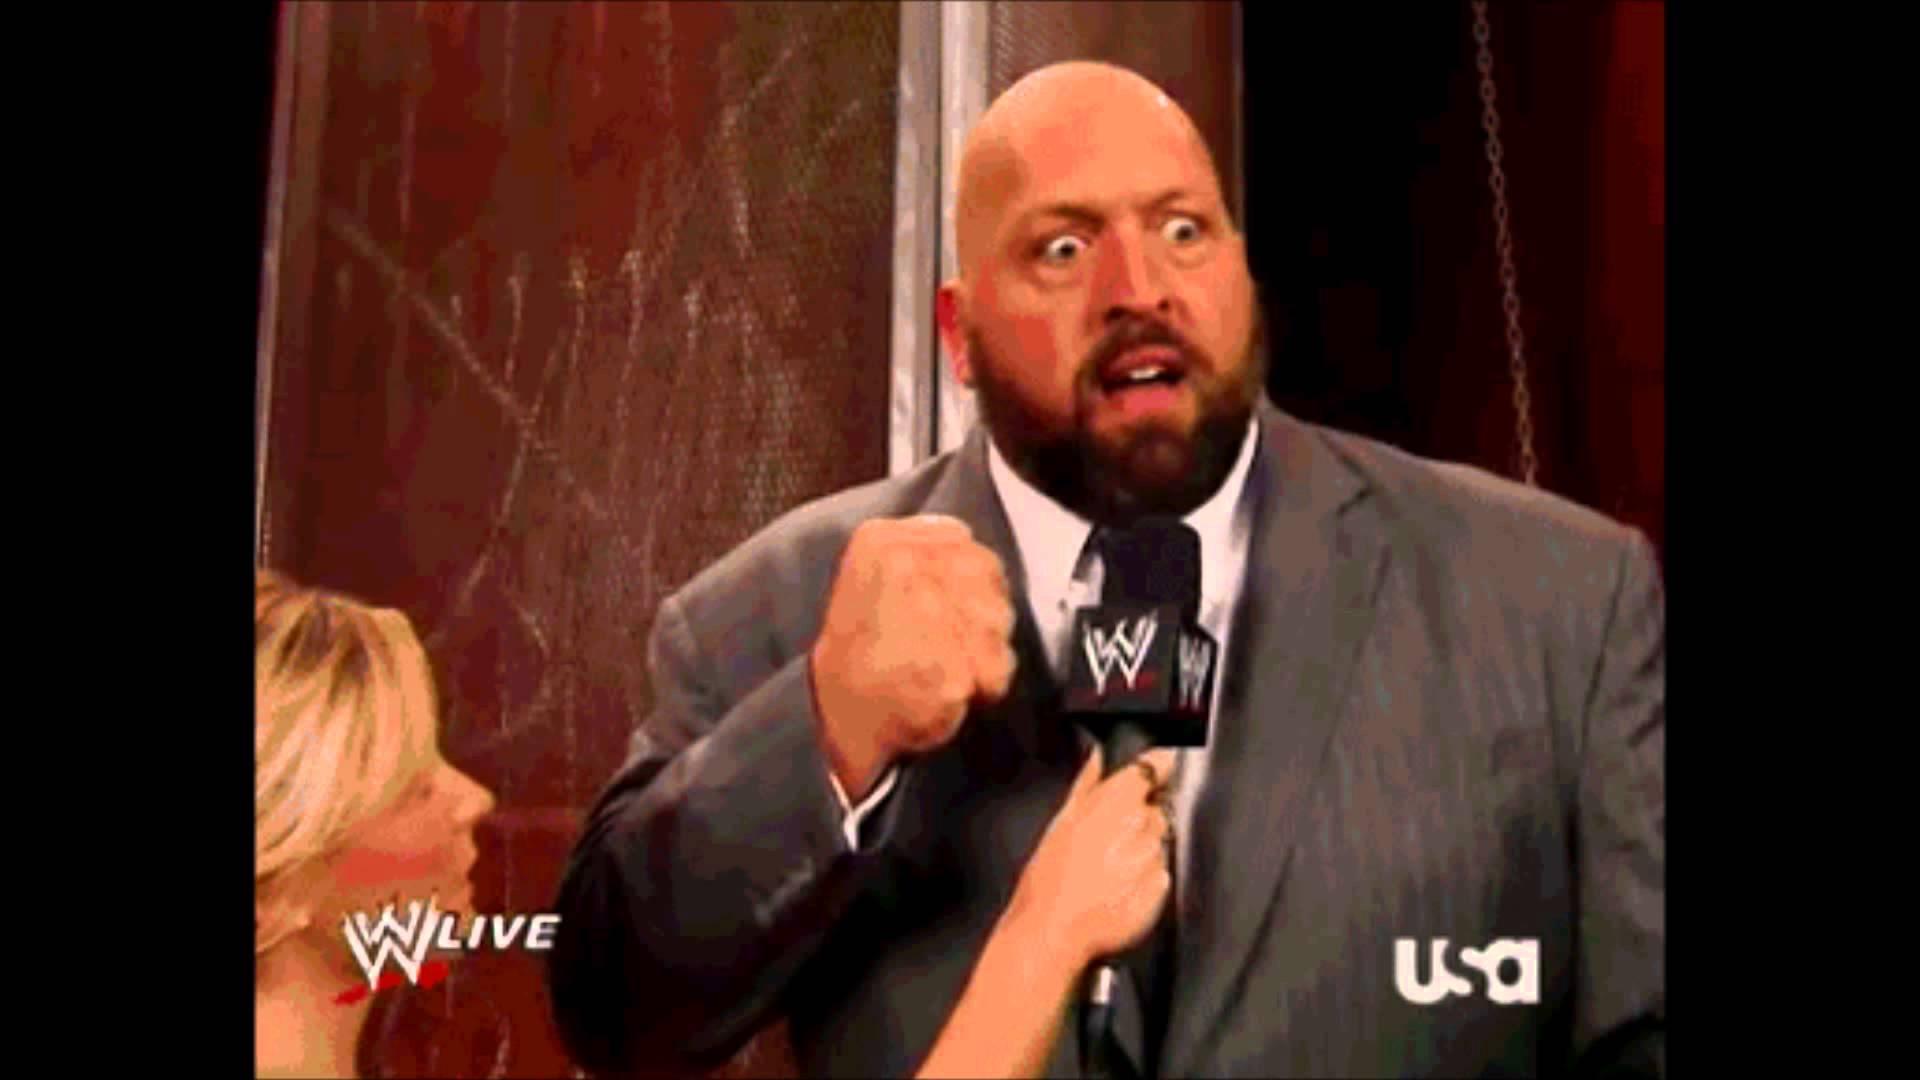 WWE Live USA Big Show Meme